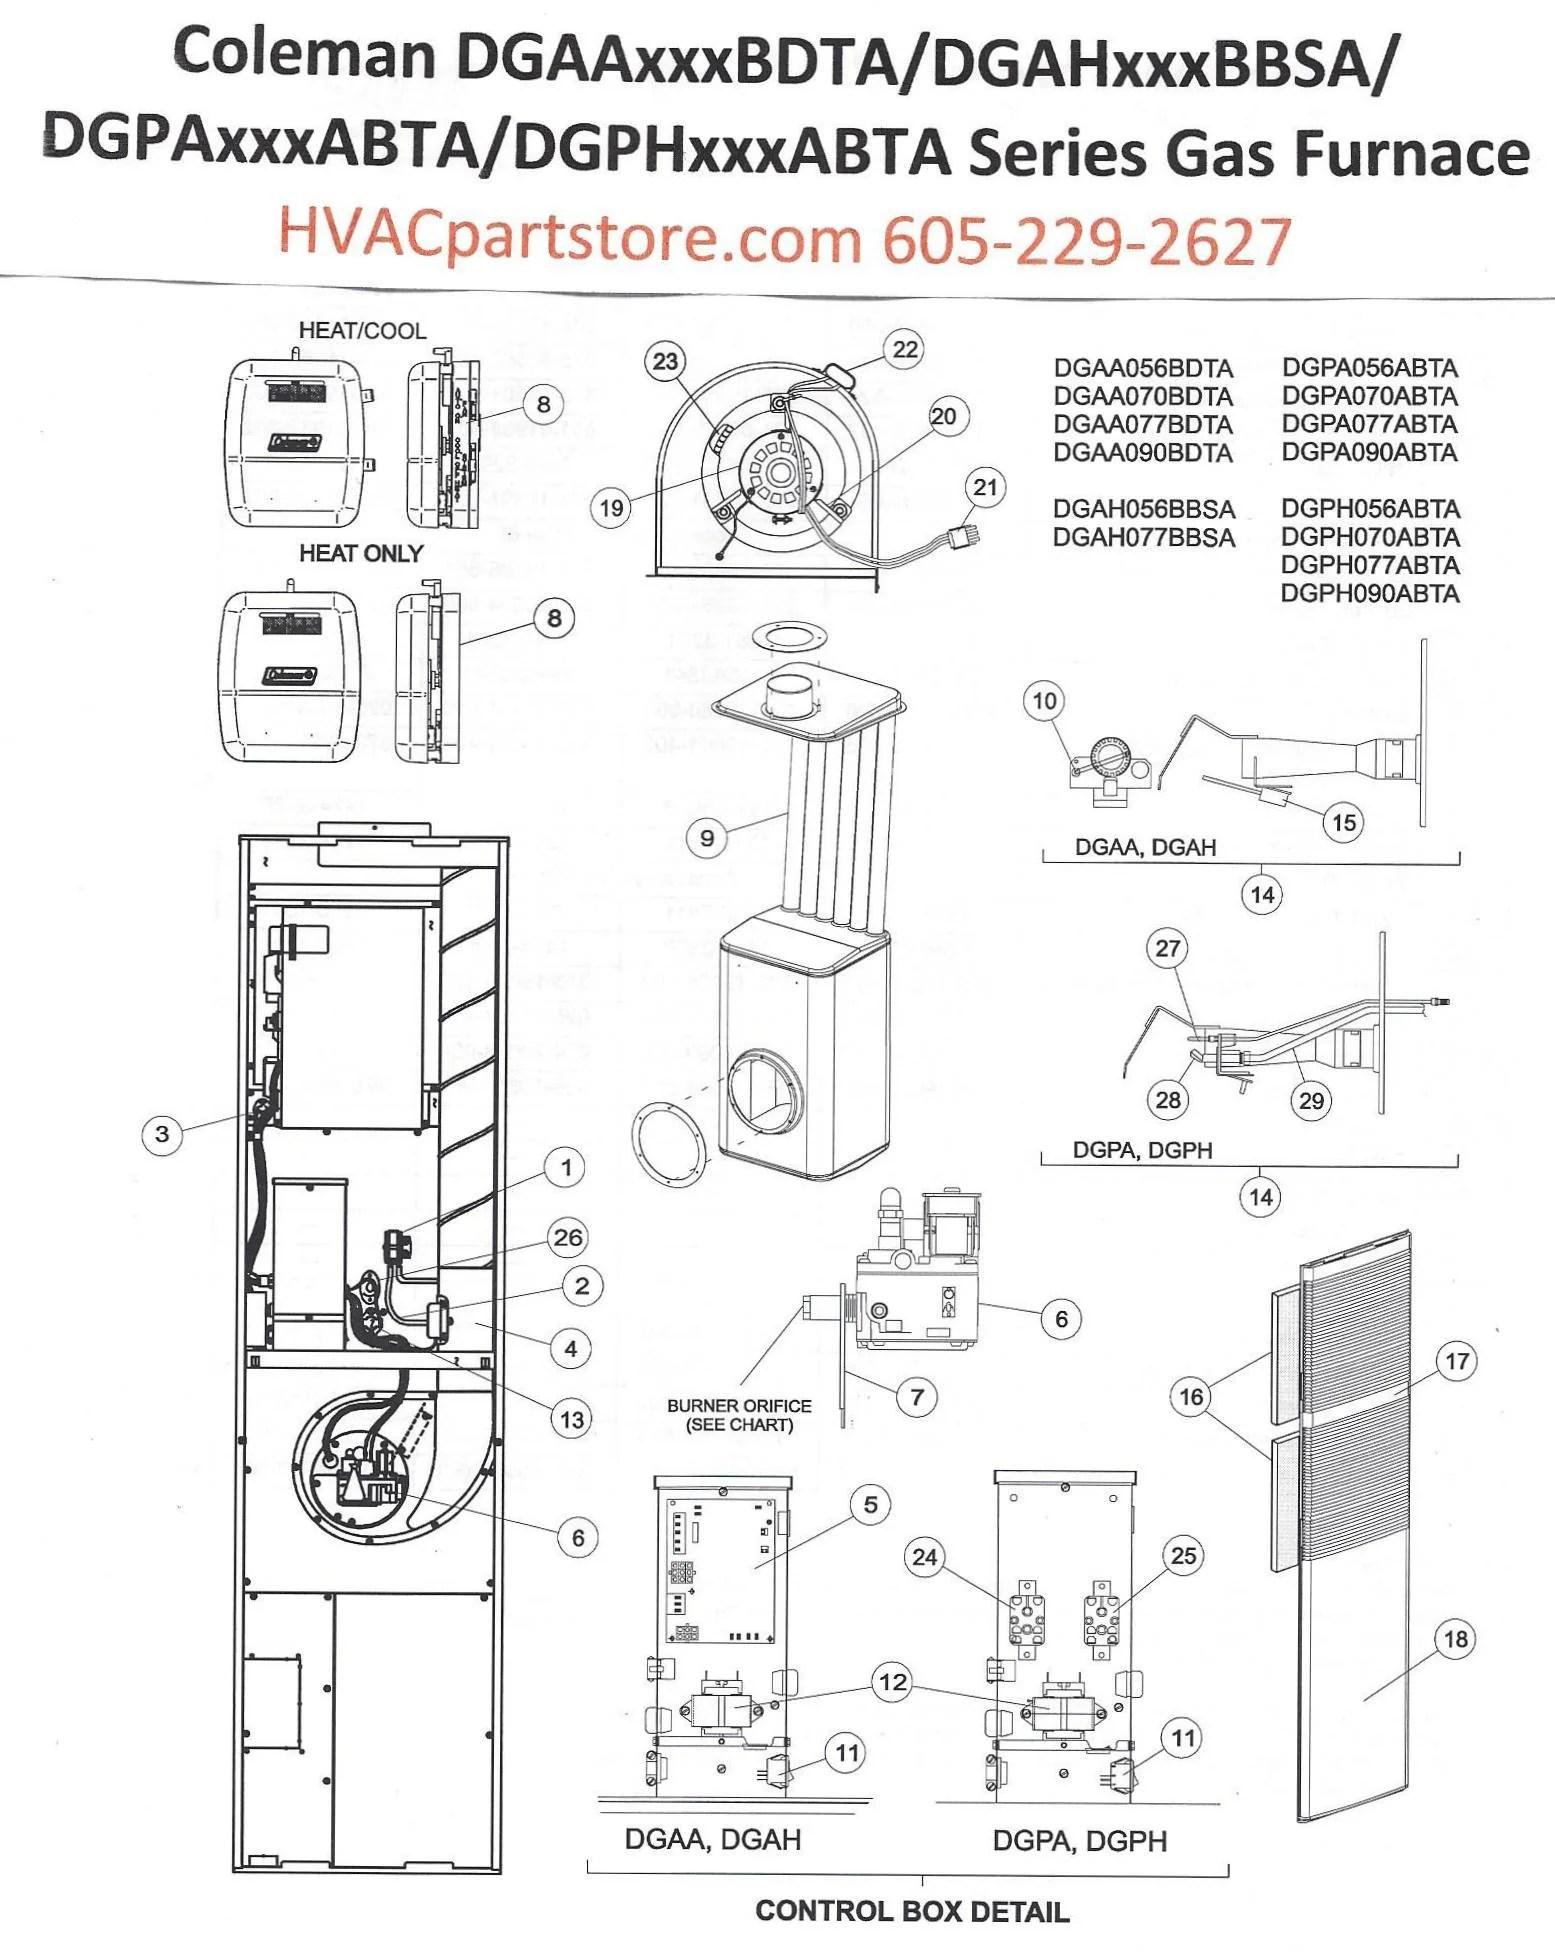 DGAA077BDTA Coleman Gas Furnace Parts – HVACpartstore